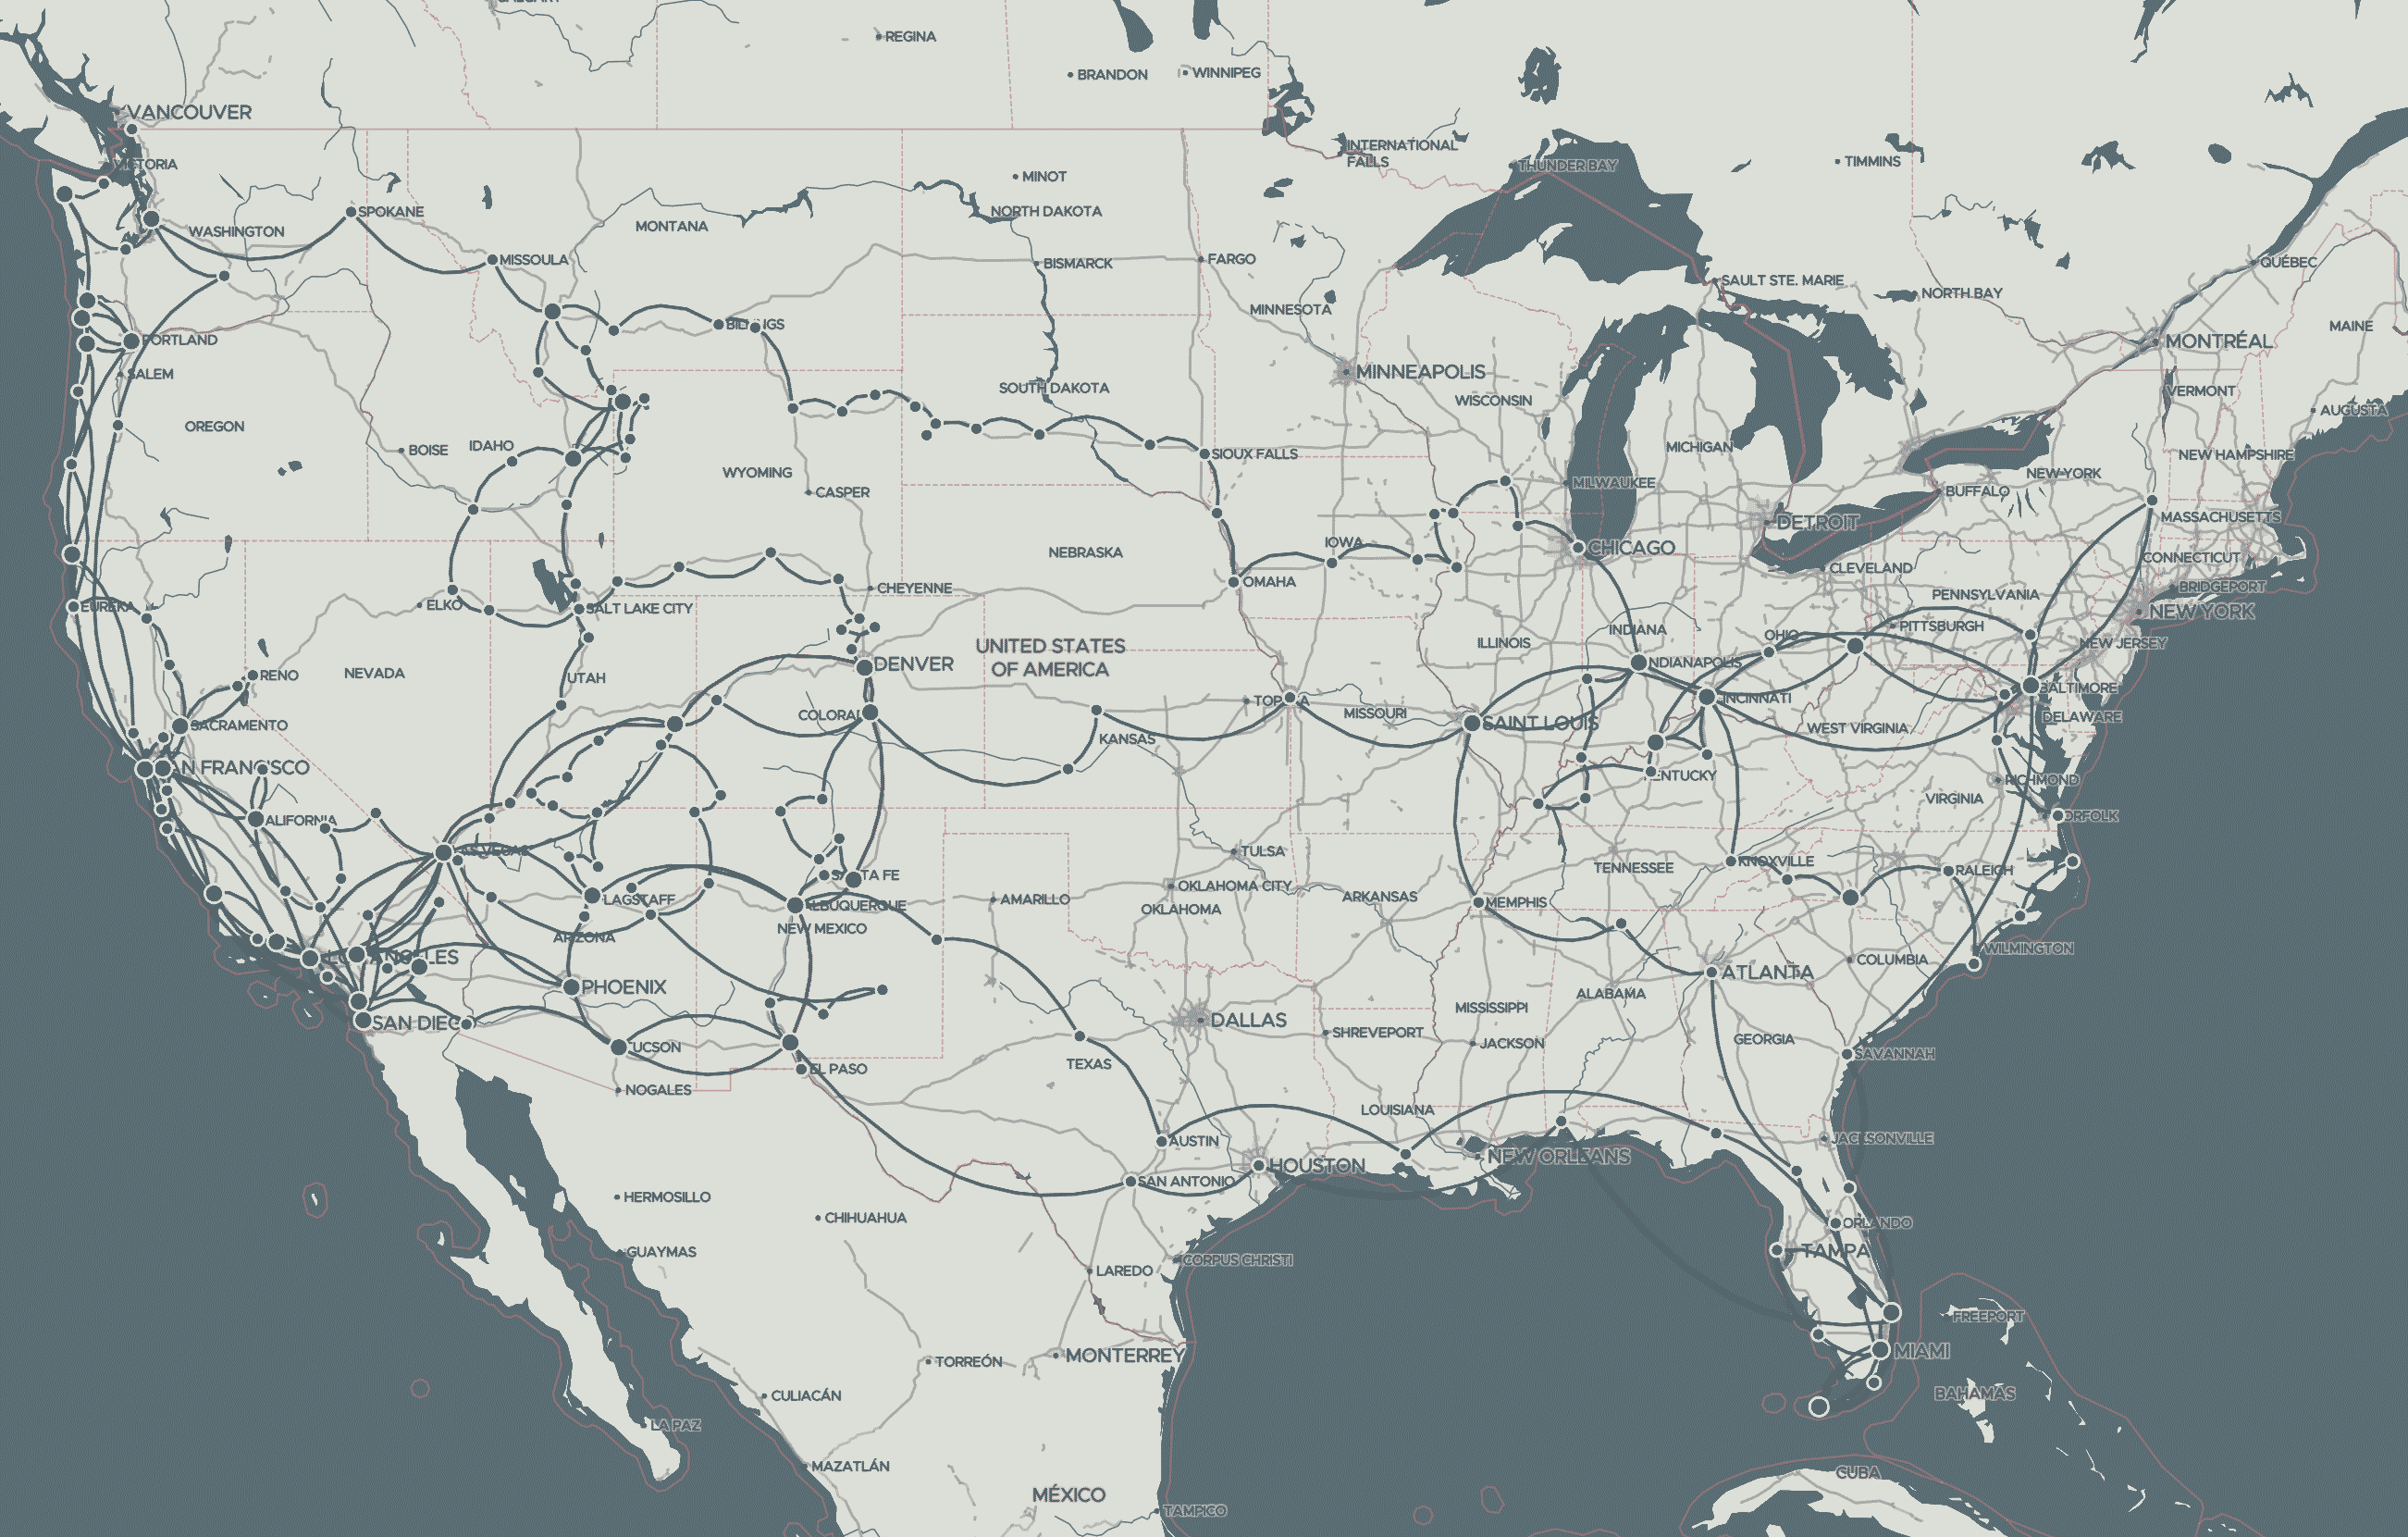 zdxp-travel-map-v2